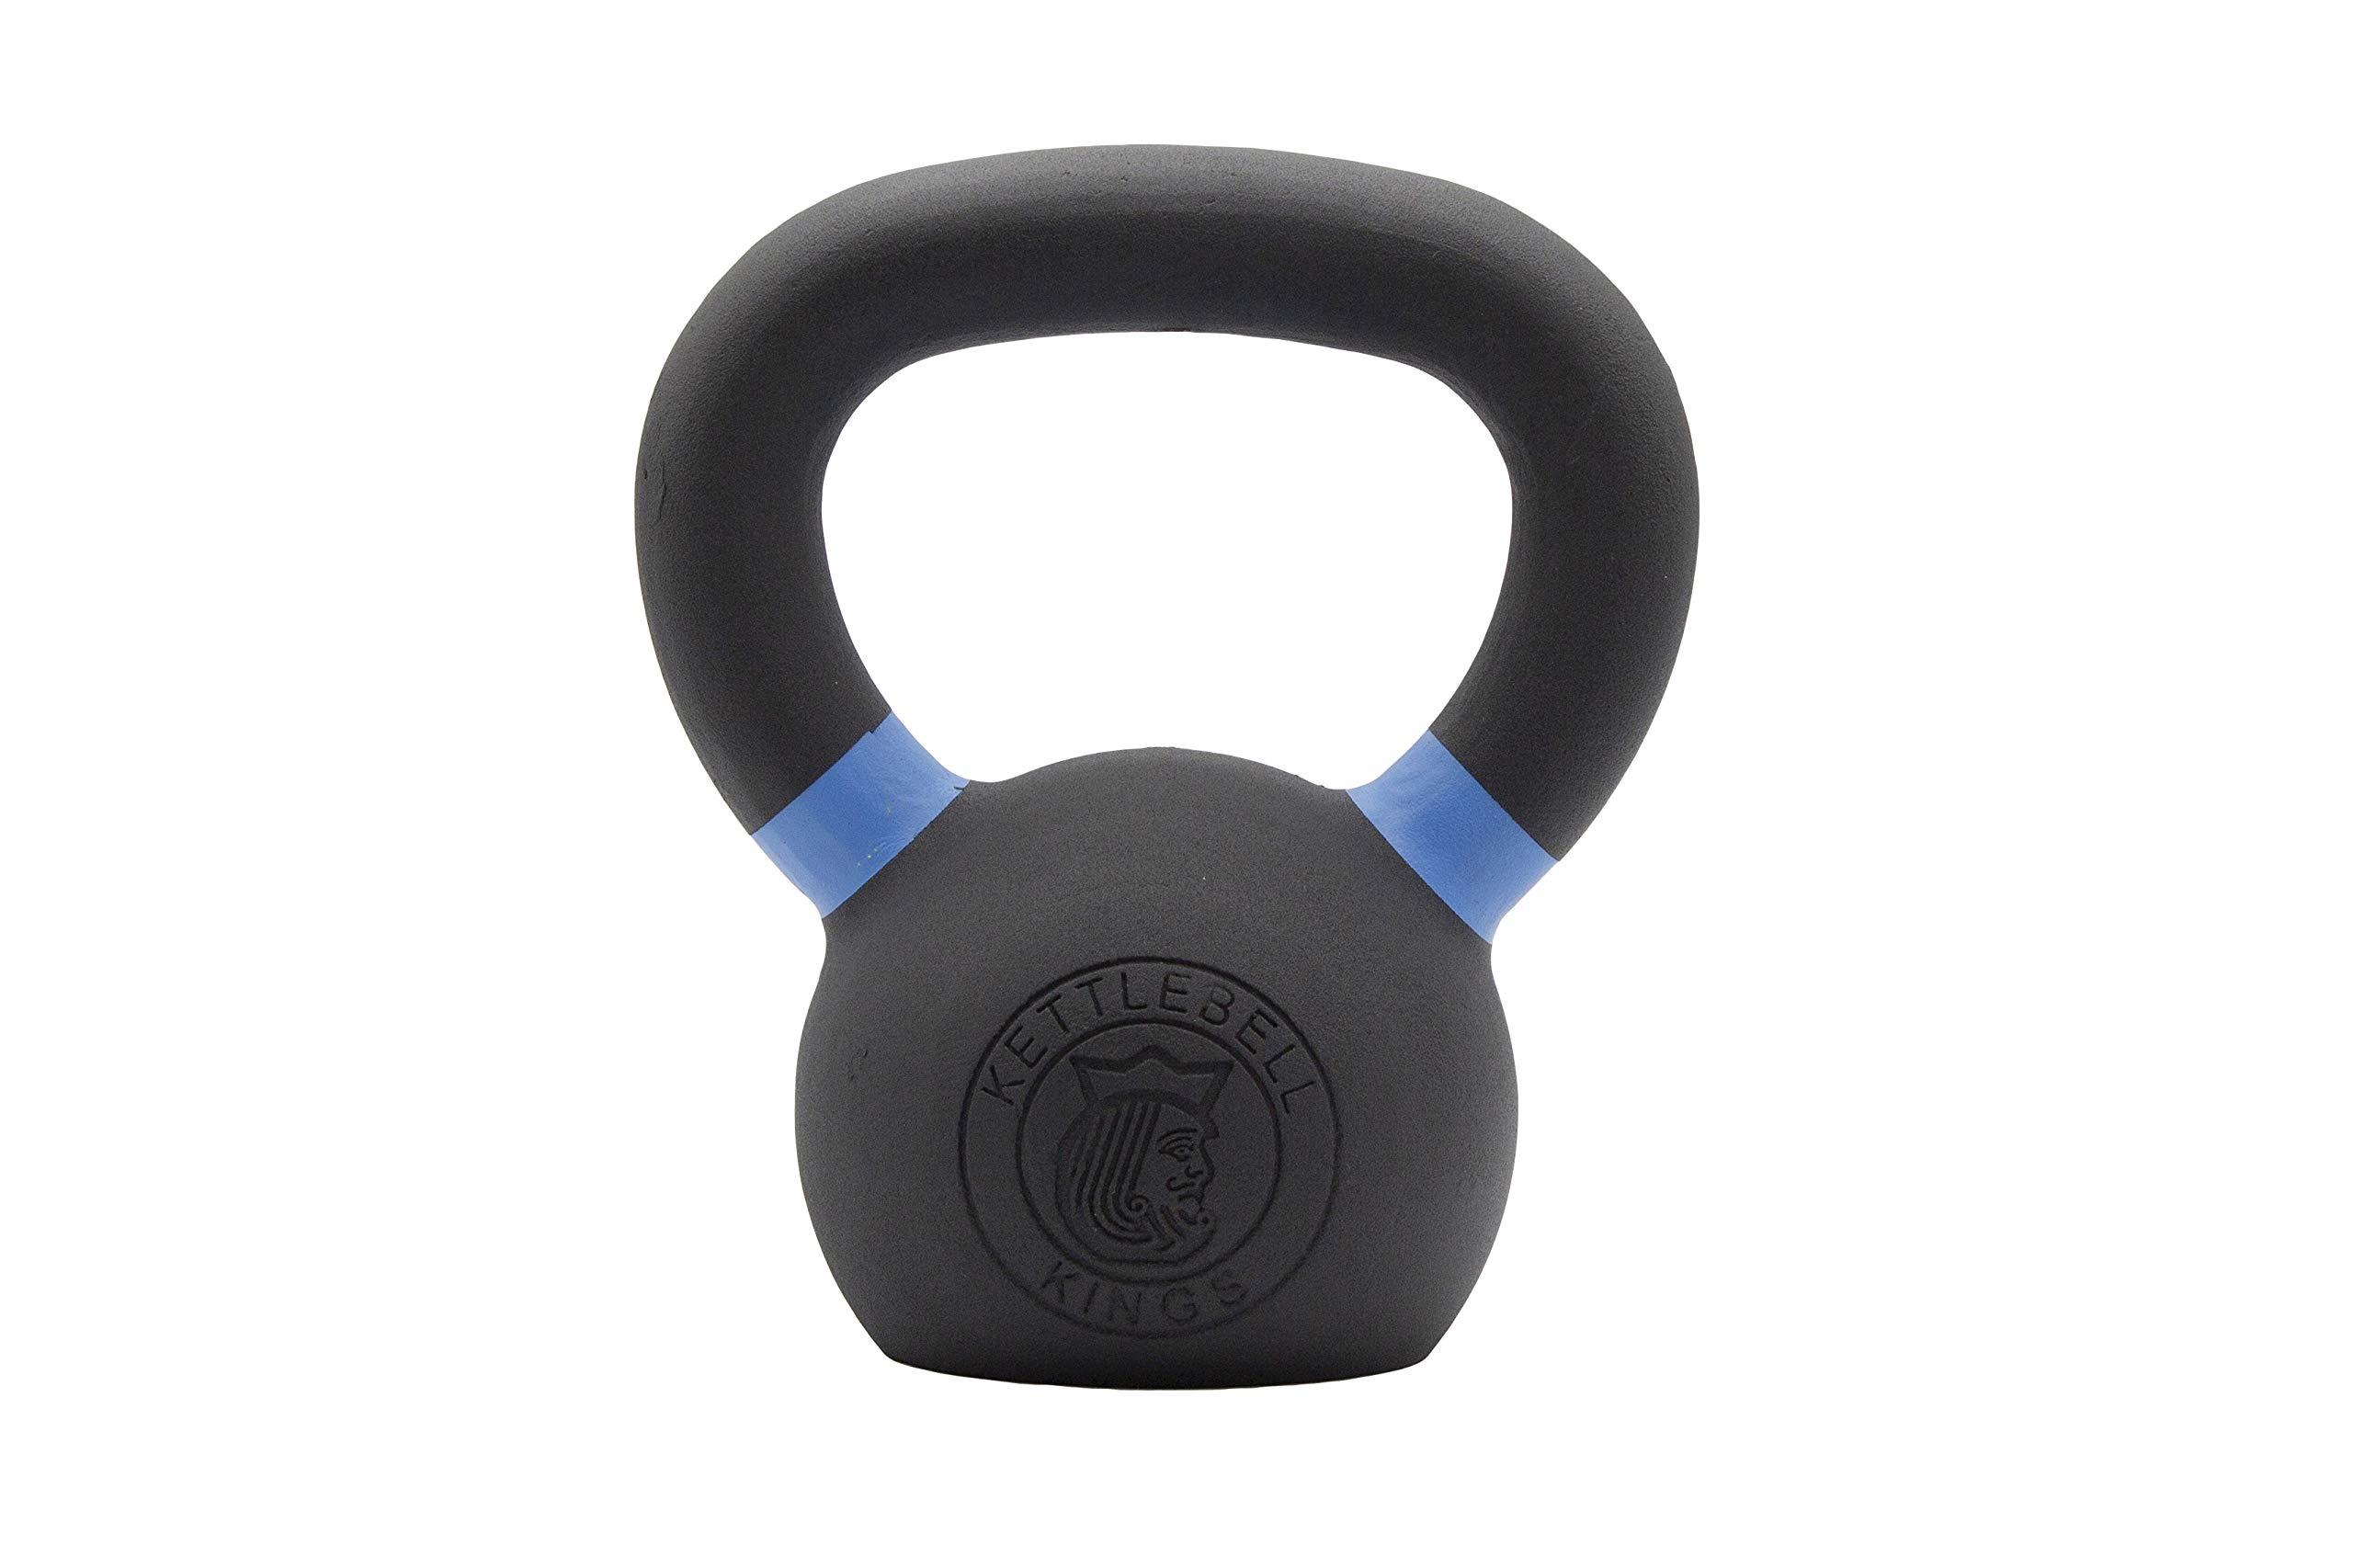 Kettlebell Kings | Kettlebell Weights | Powder Coat Kettlebell Weights for Women & Men | Powder Coating for Durability, Rust Resistance & Longevity (6)